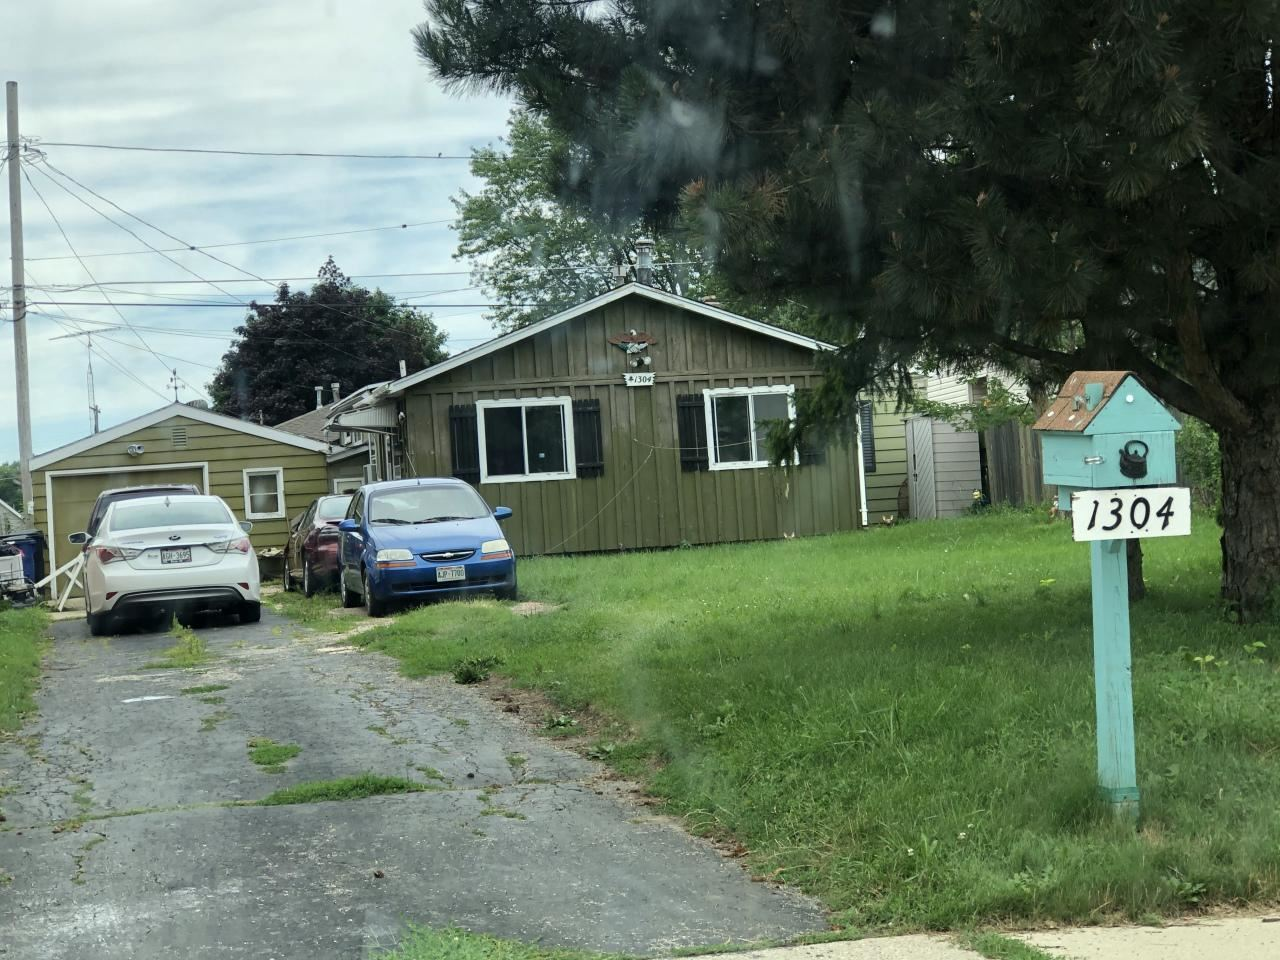 1304 Oregon St, Racine, WI 53405 - MLS#: 1702823